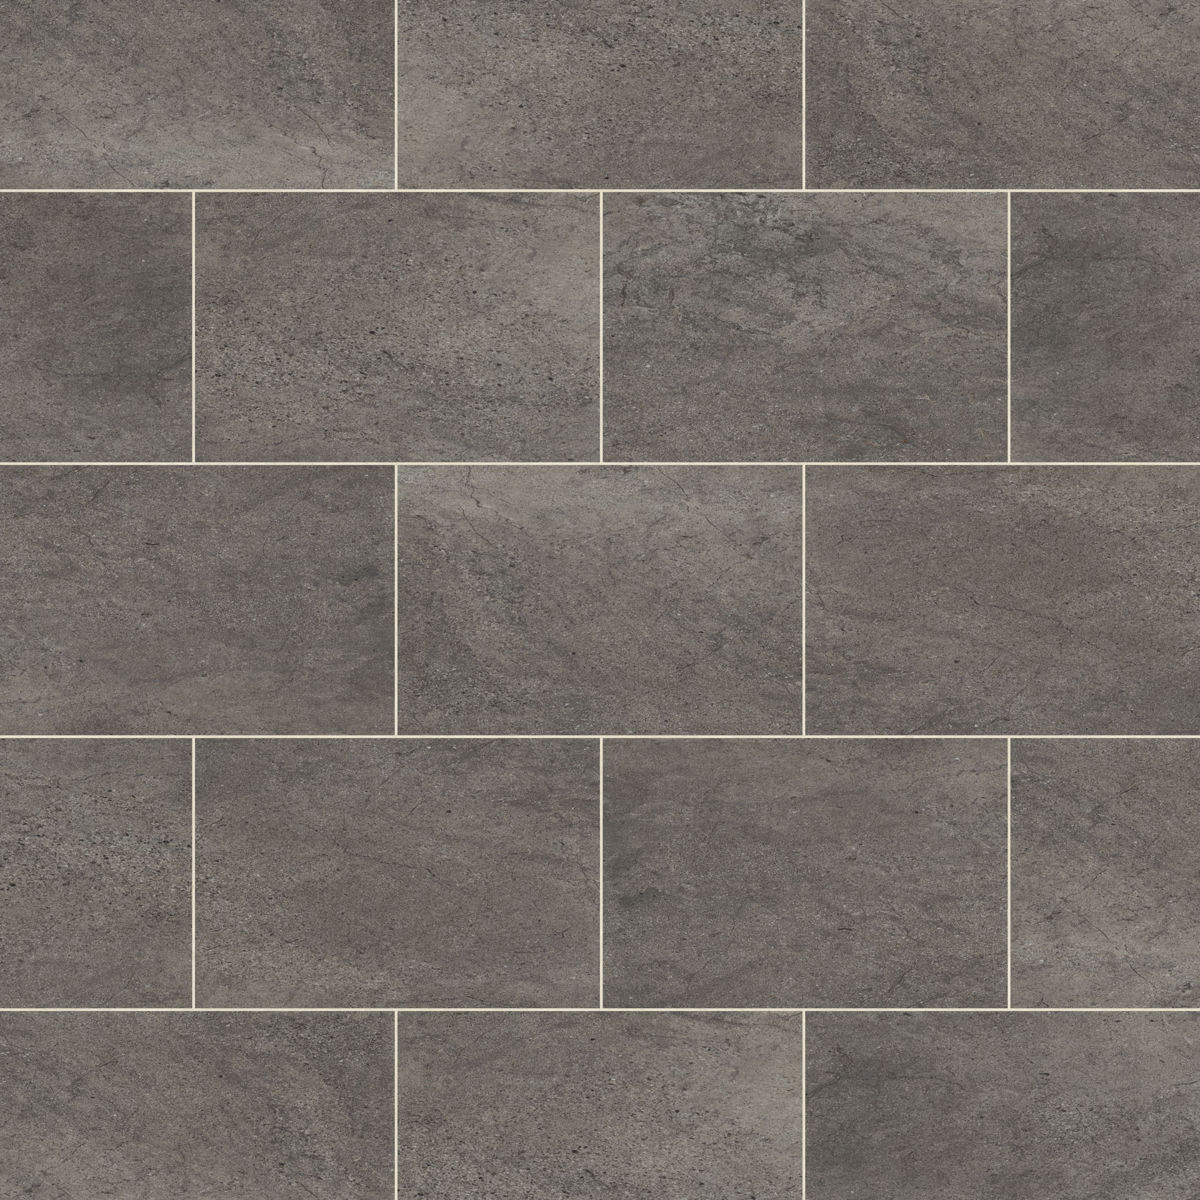 Marble Laminate Flooring